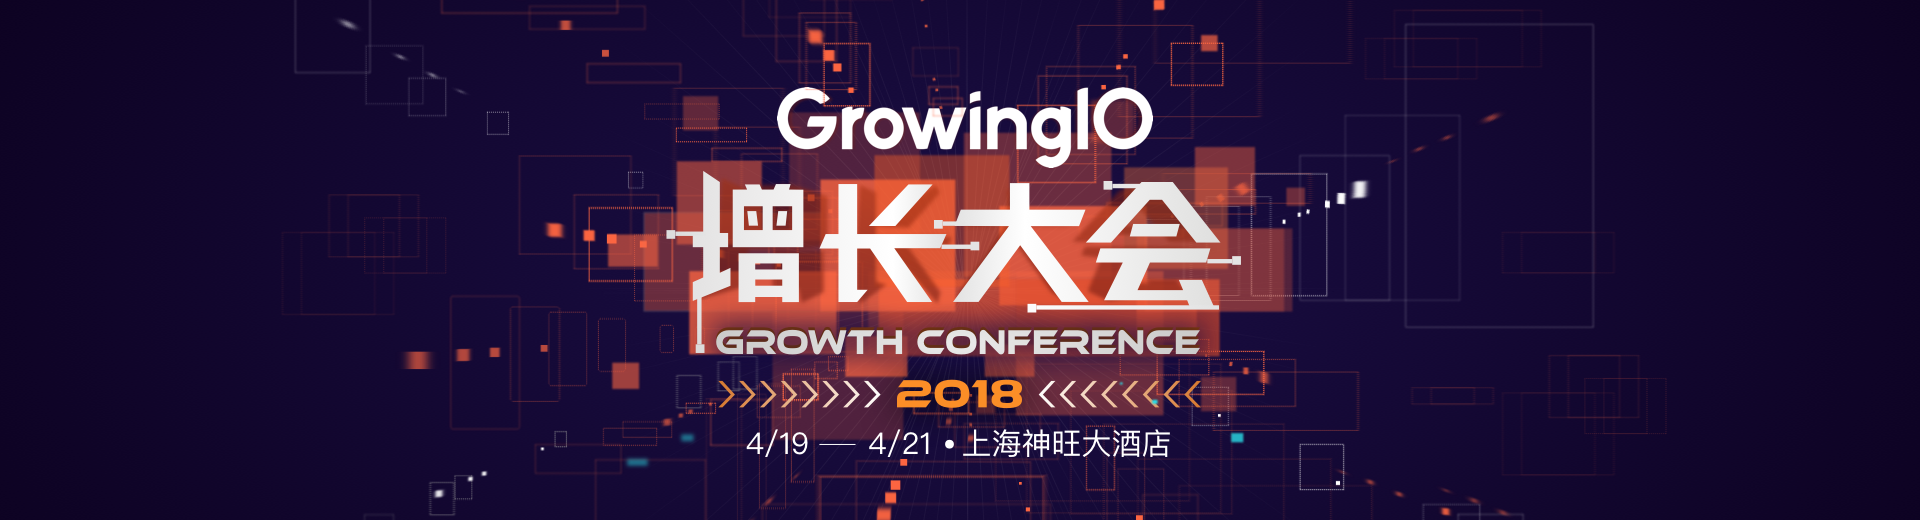 GrowingIO 2018 增长大会上海站 - 成为下一位首席增长官